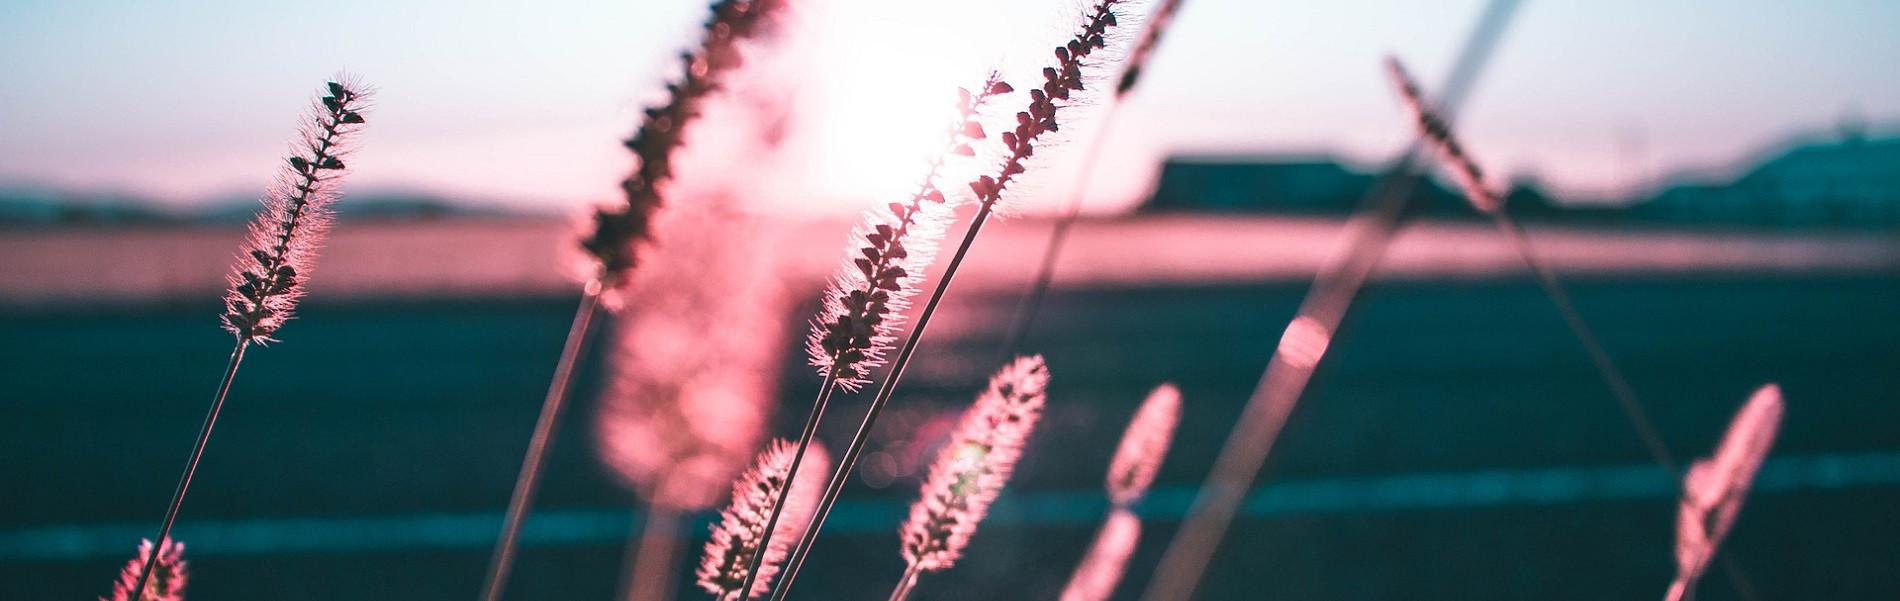 Grassprieten en avondzon